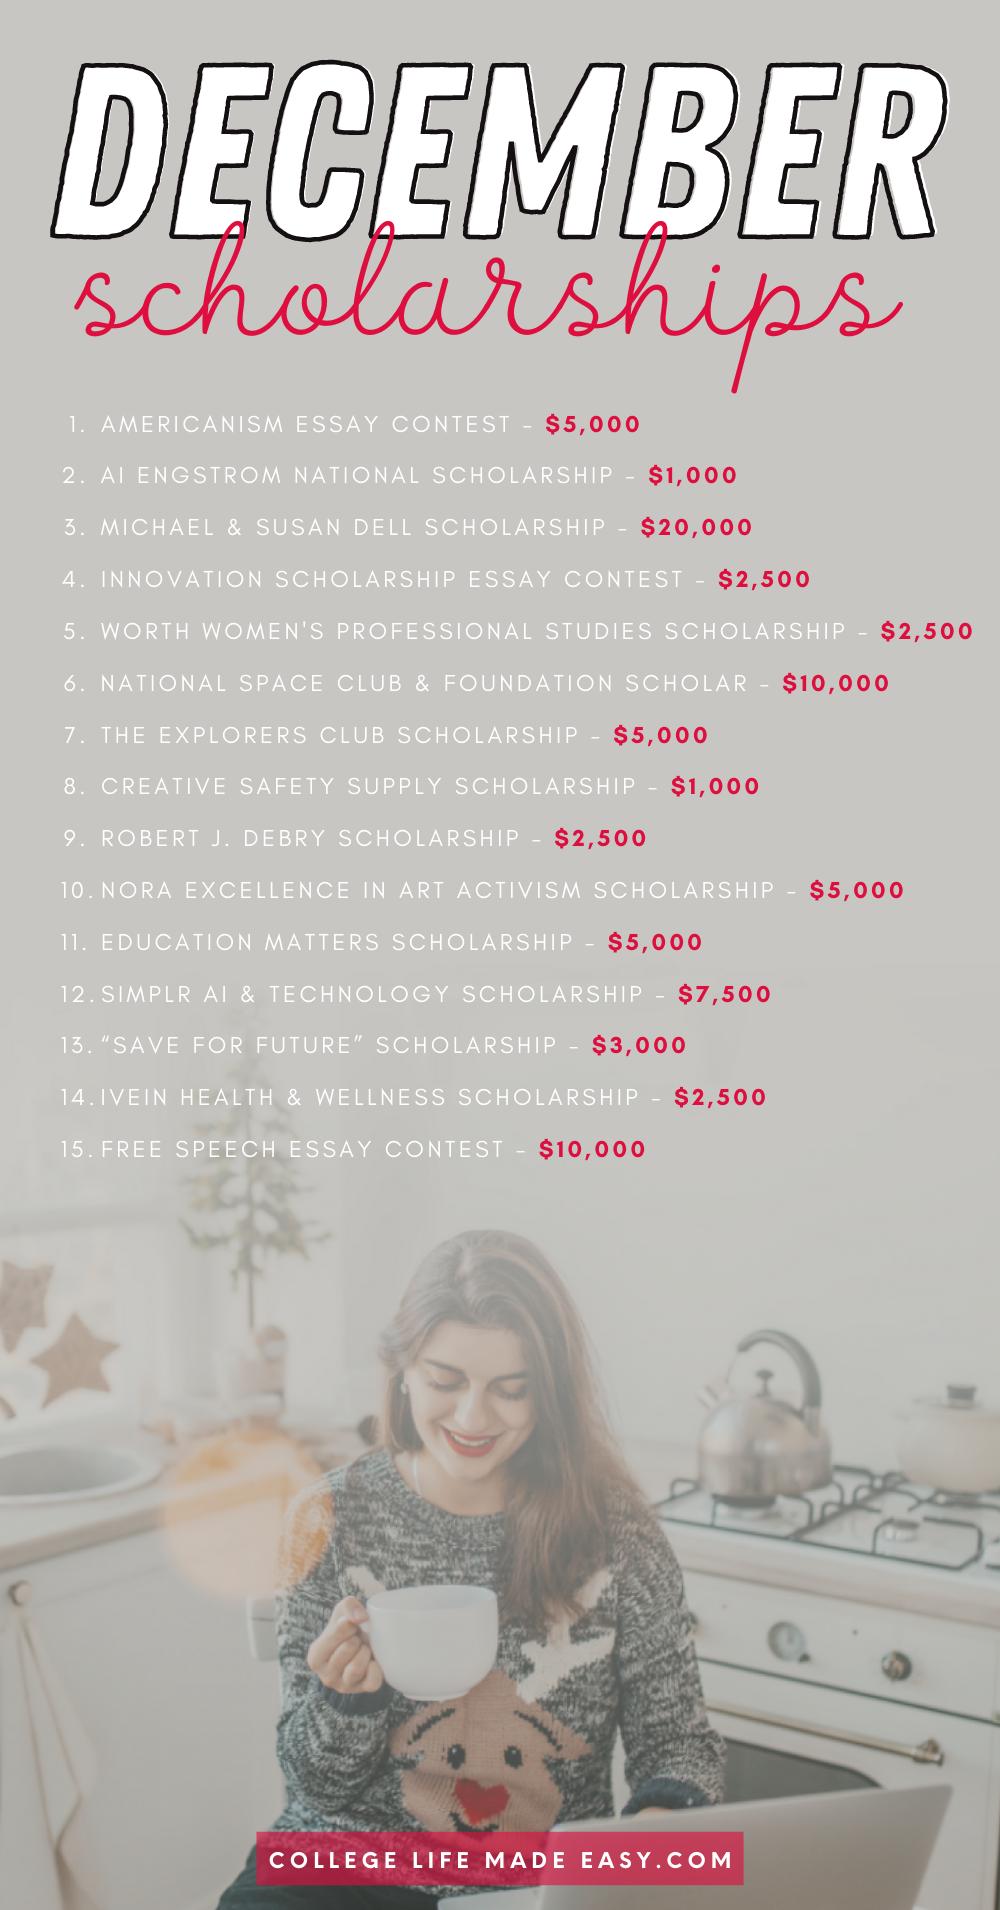 December scholarships infographic list